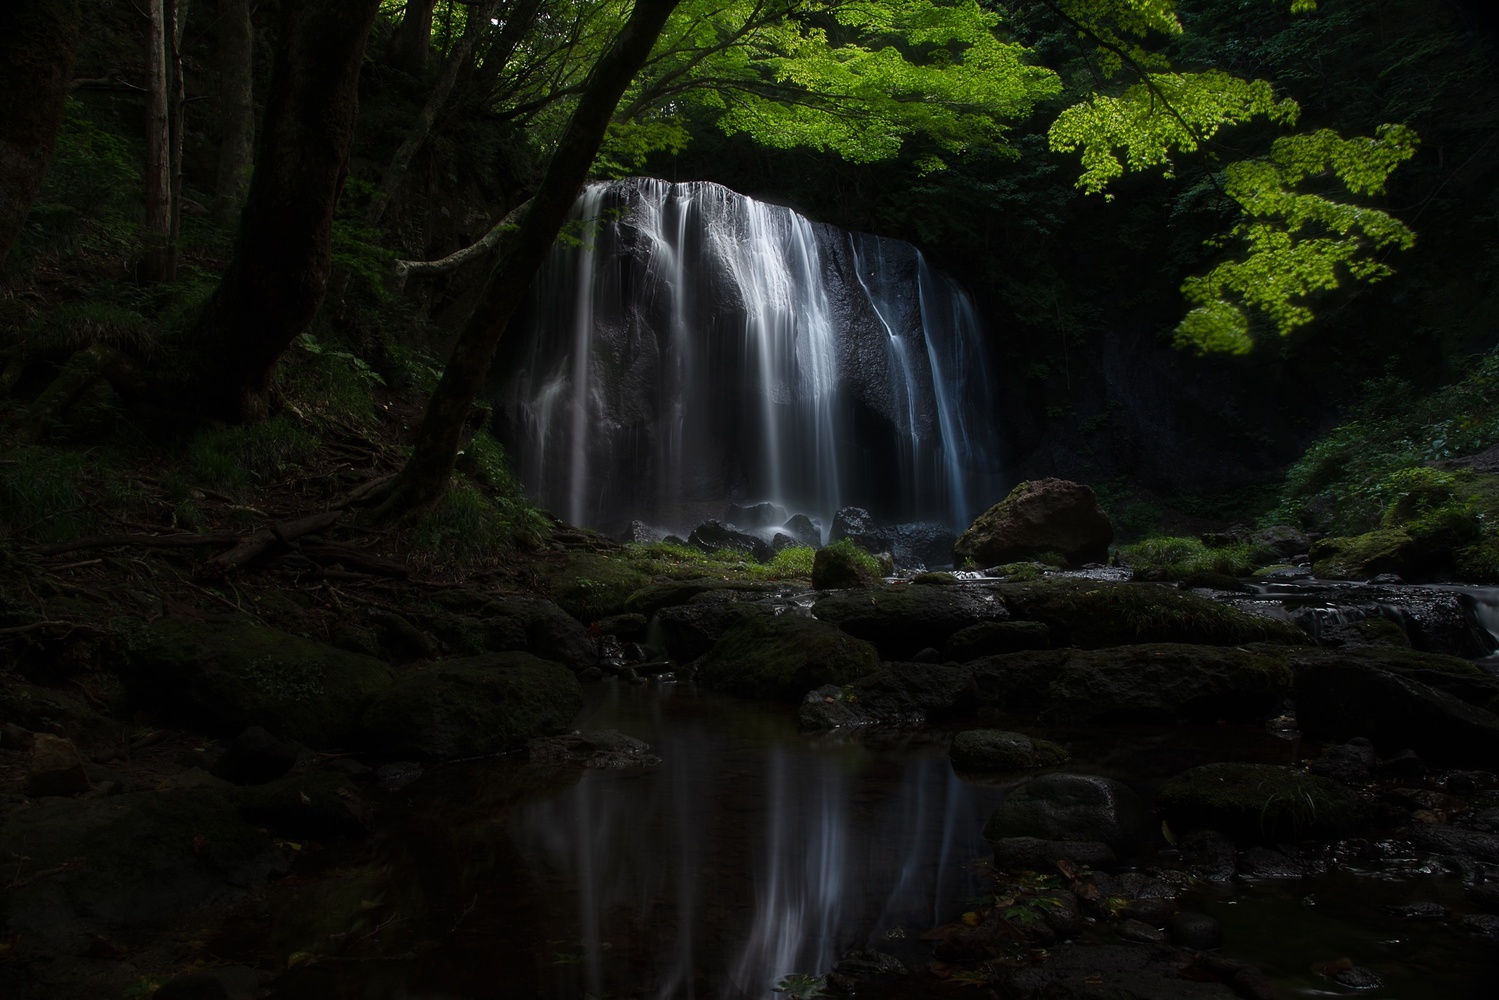 Waterfall by Masataka Inada